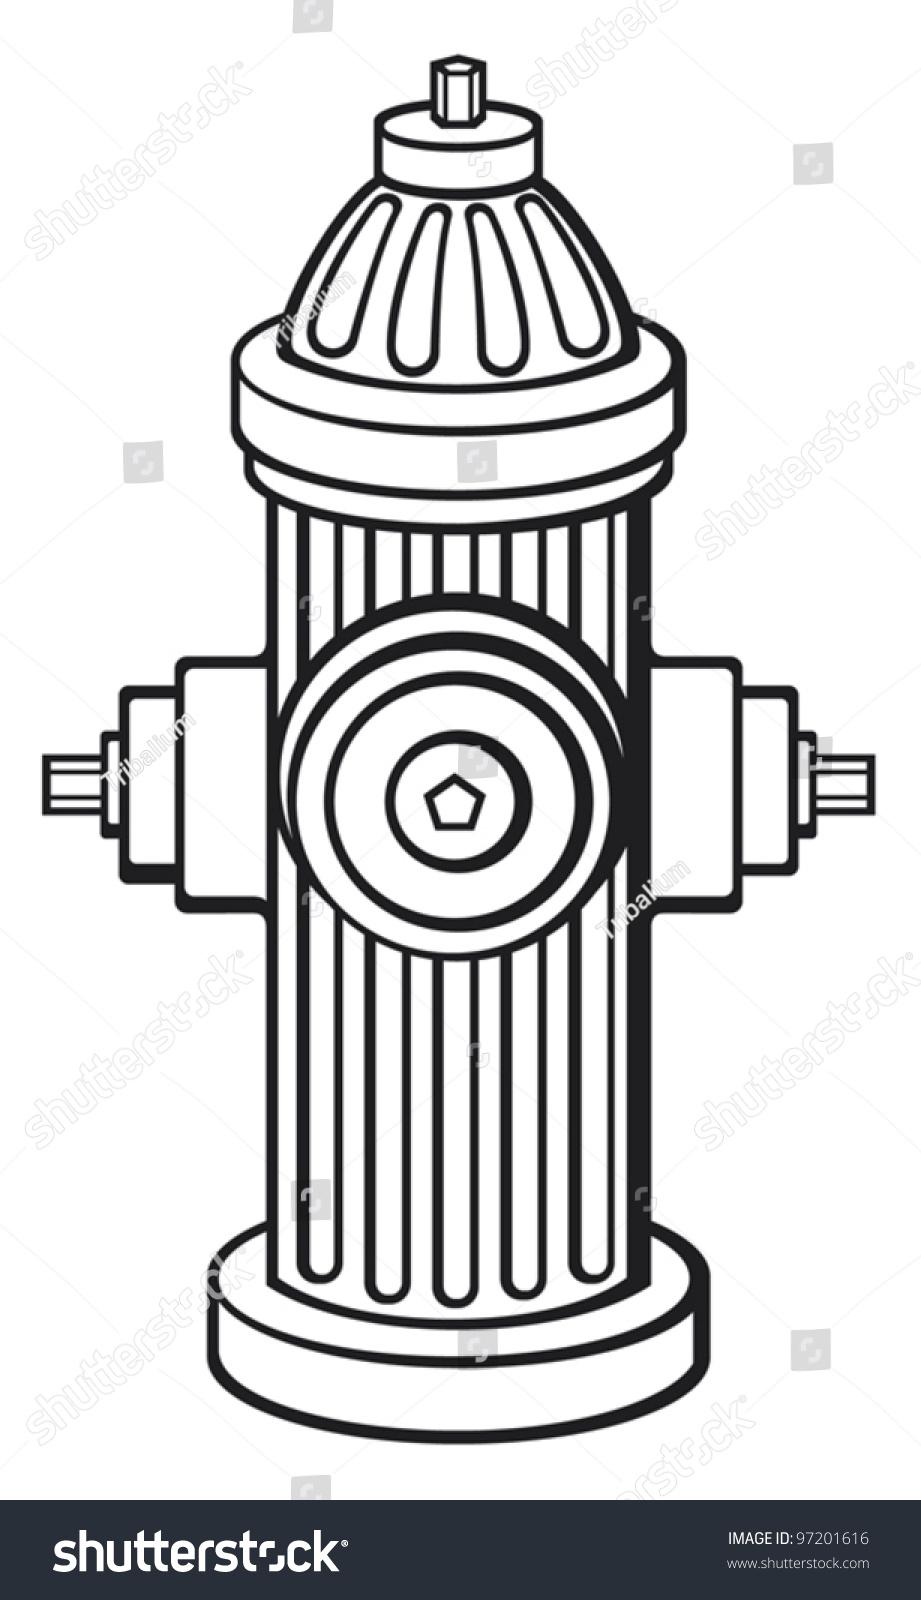 Clip Art Fire Hydrant Clipart fire hydrant stock vector 97201616 shutterstock hydrant